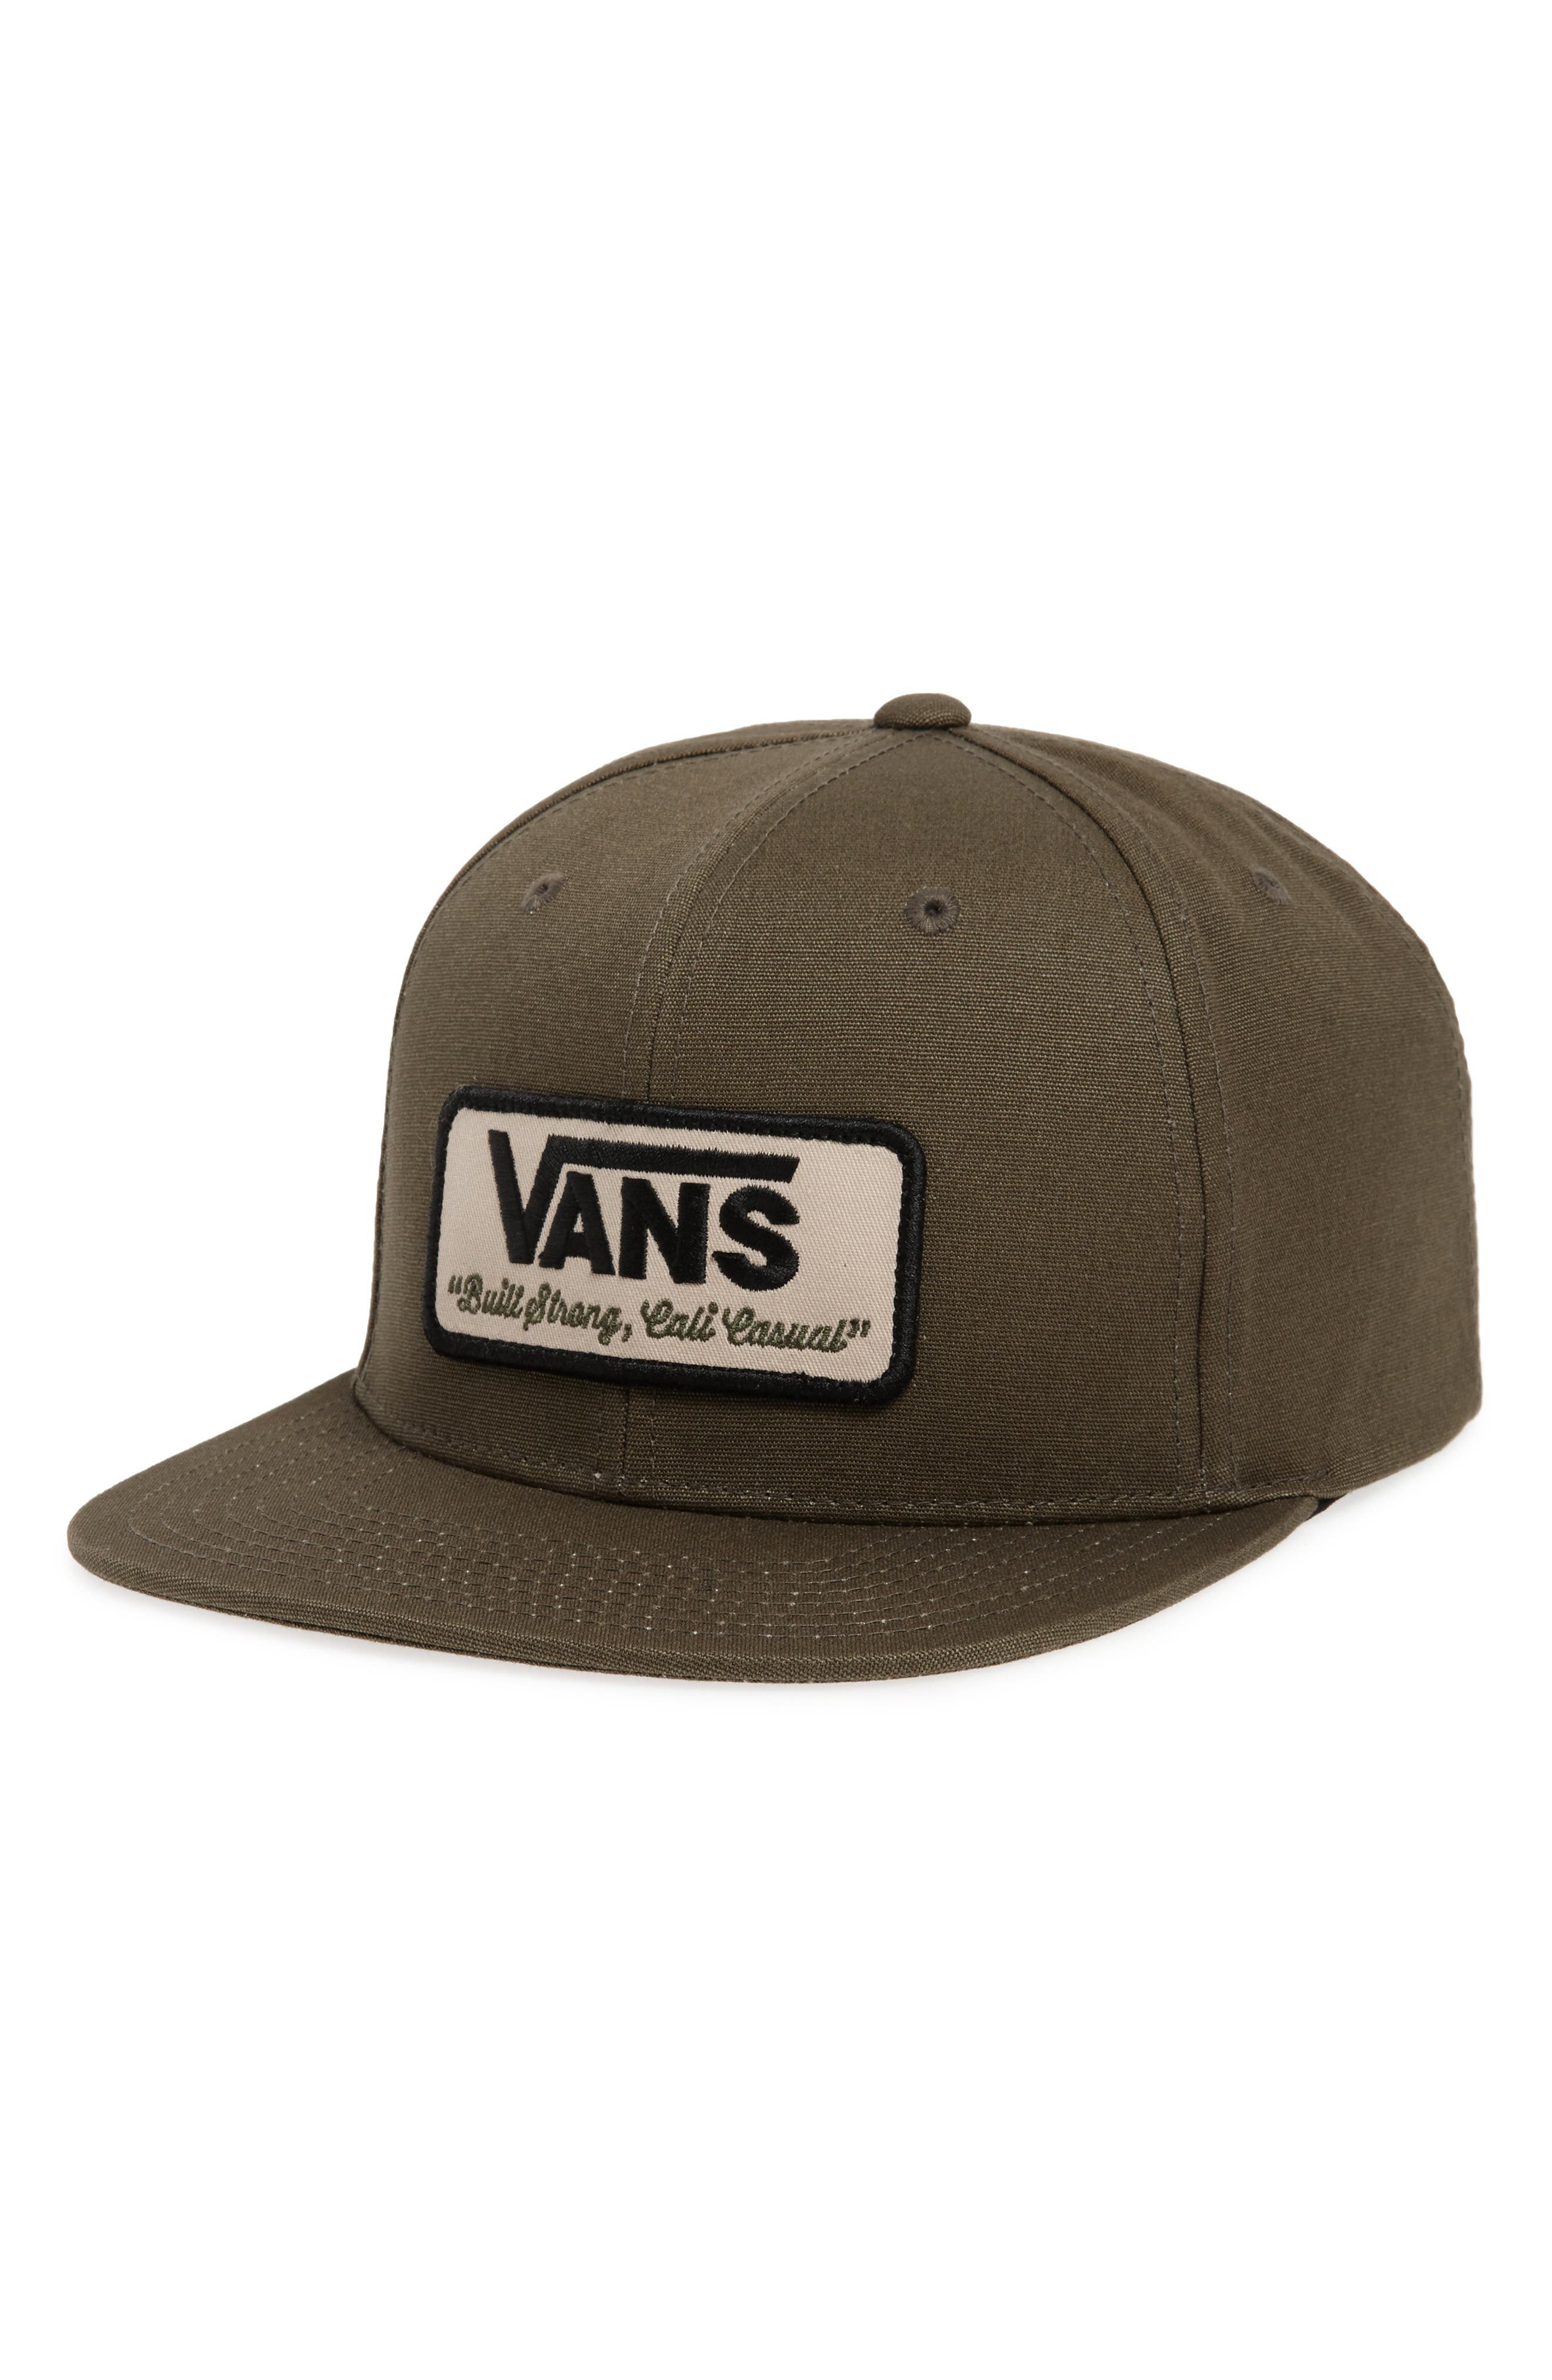 Main Image - Vans 'Rowley' Snapback Hat